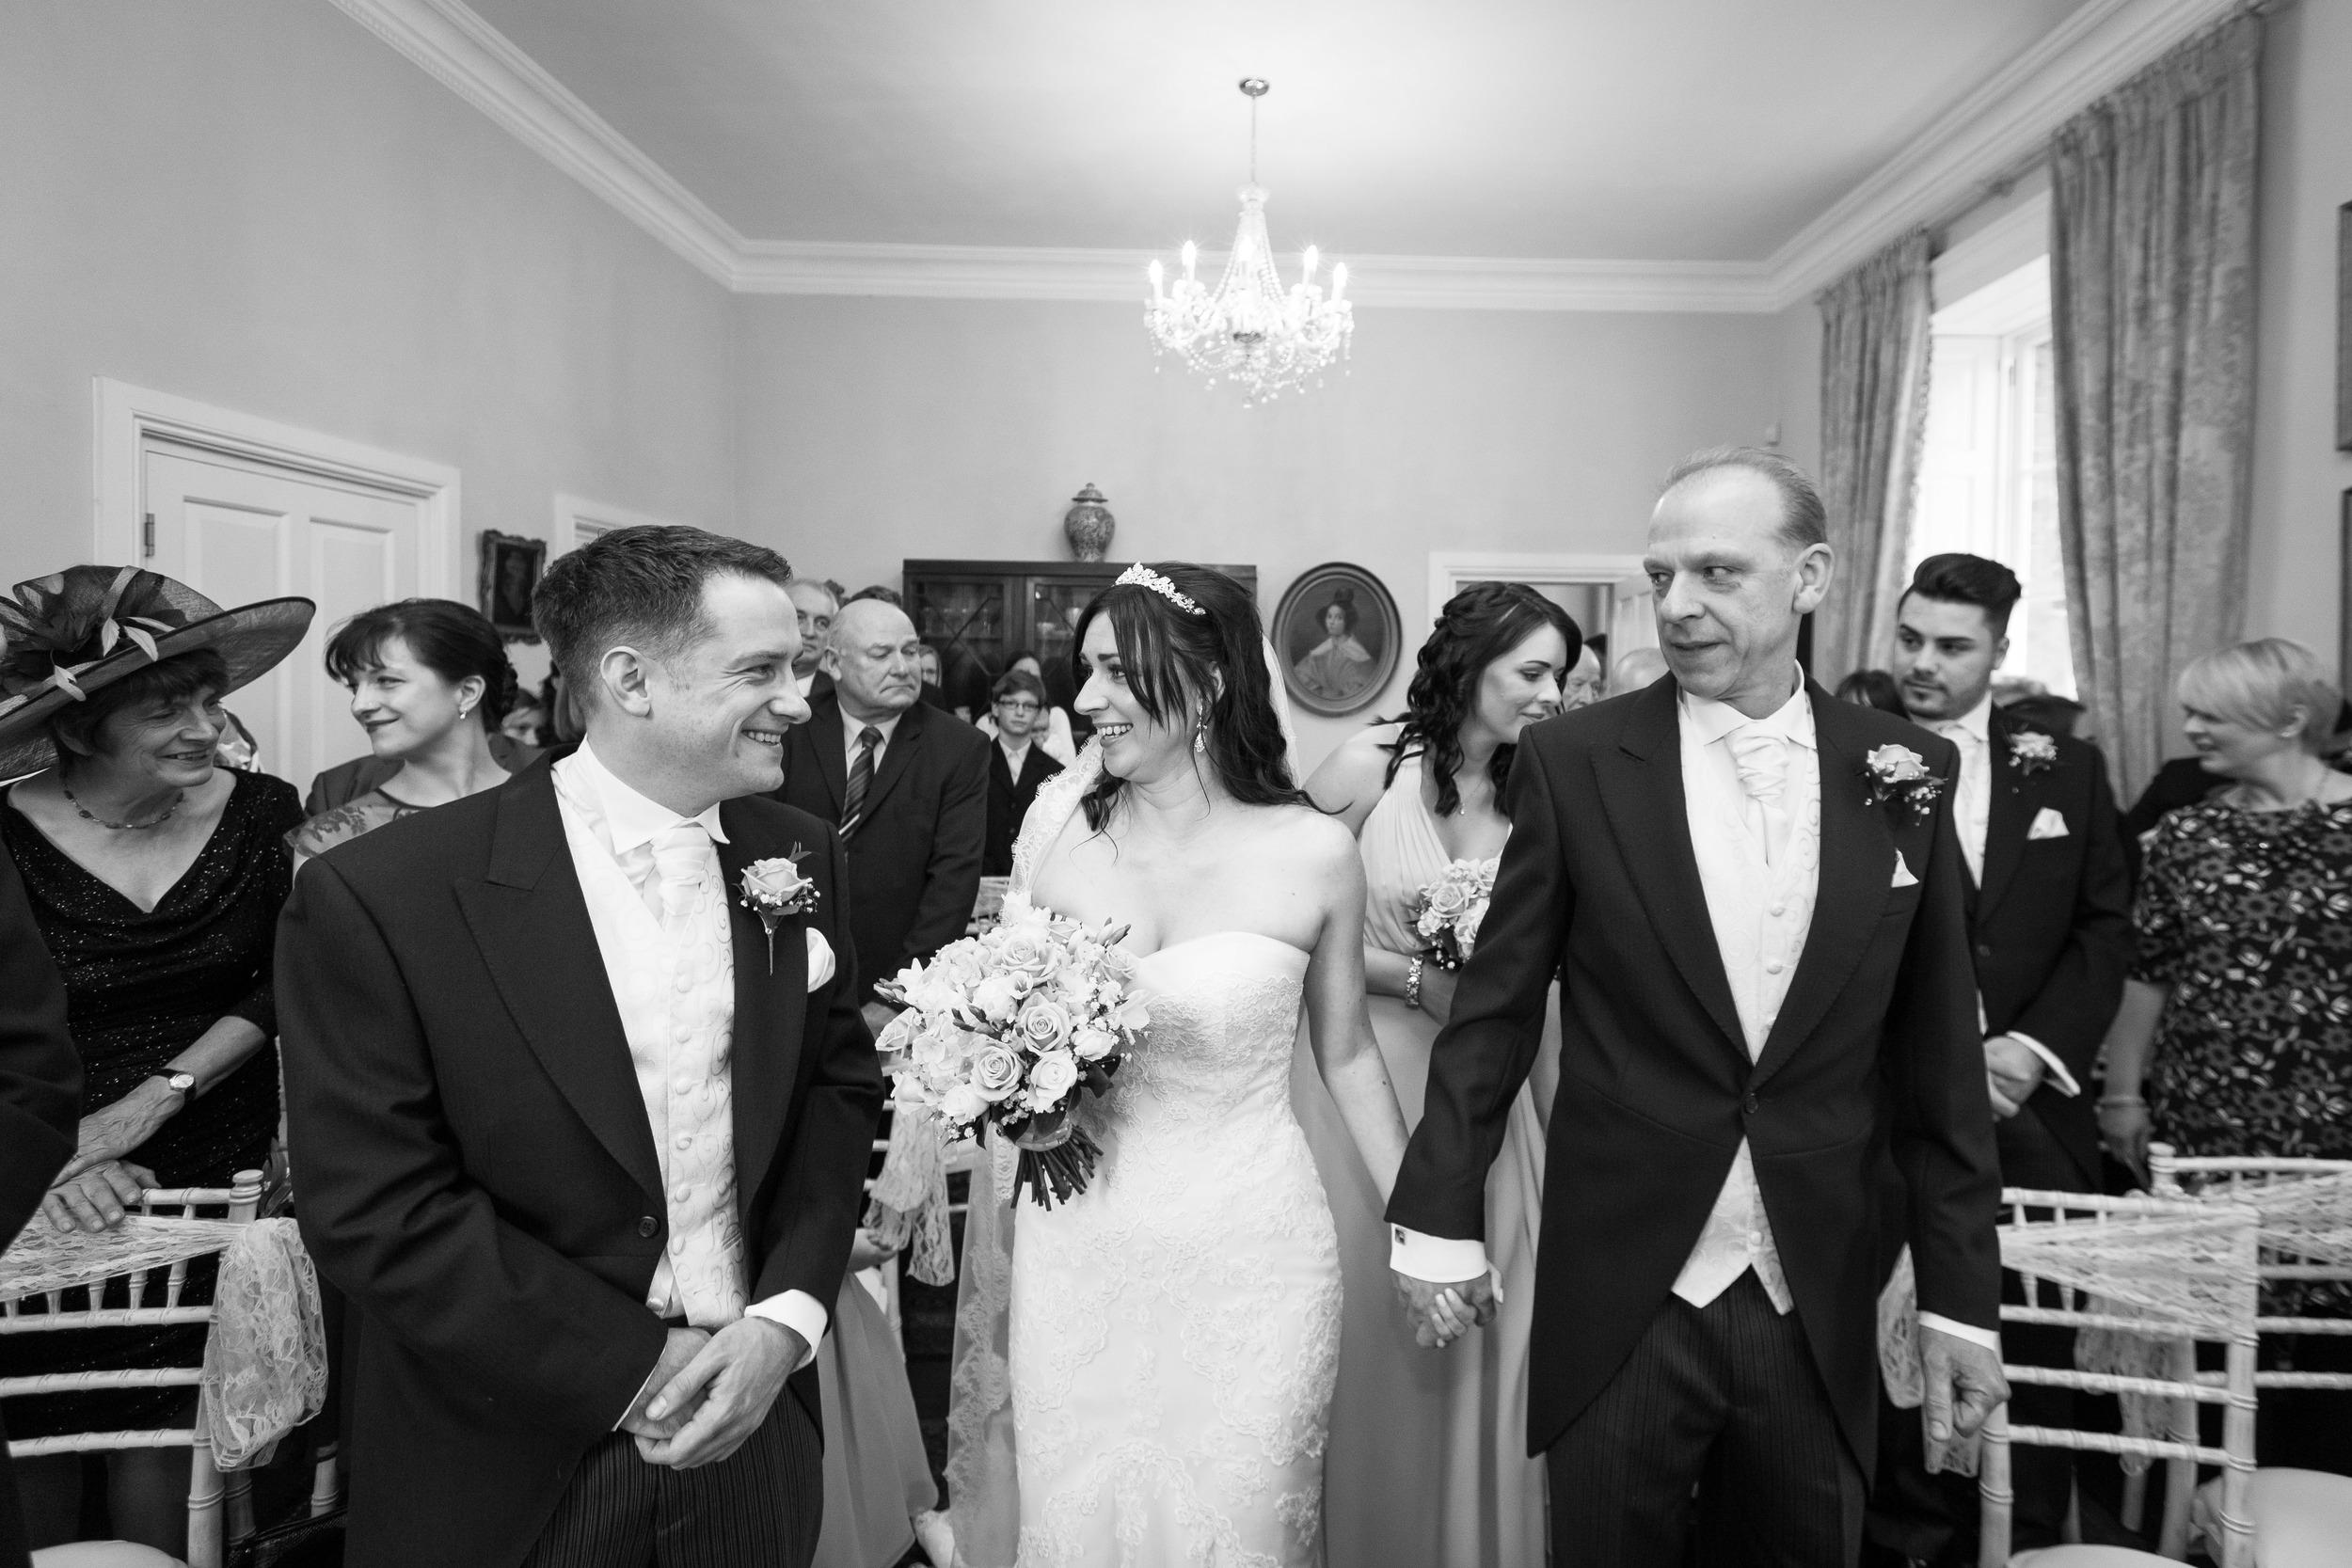 Mr-And-Mrs-Cunningham-109.jpg